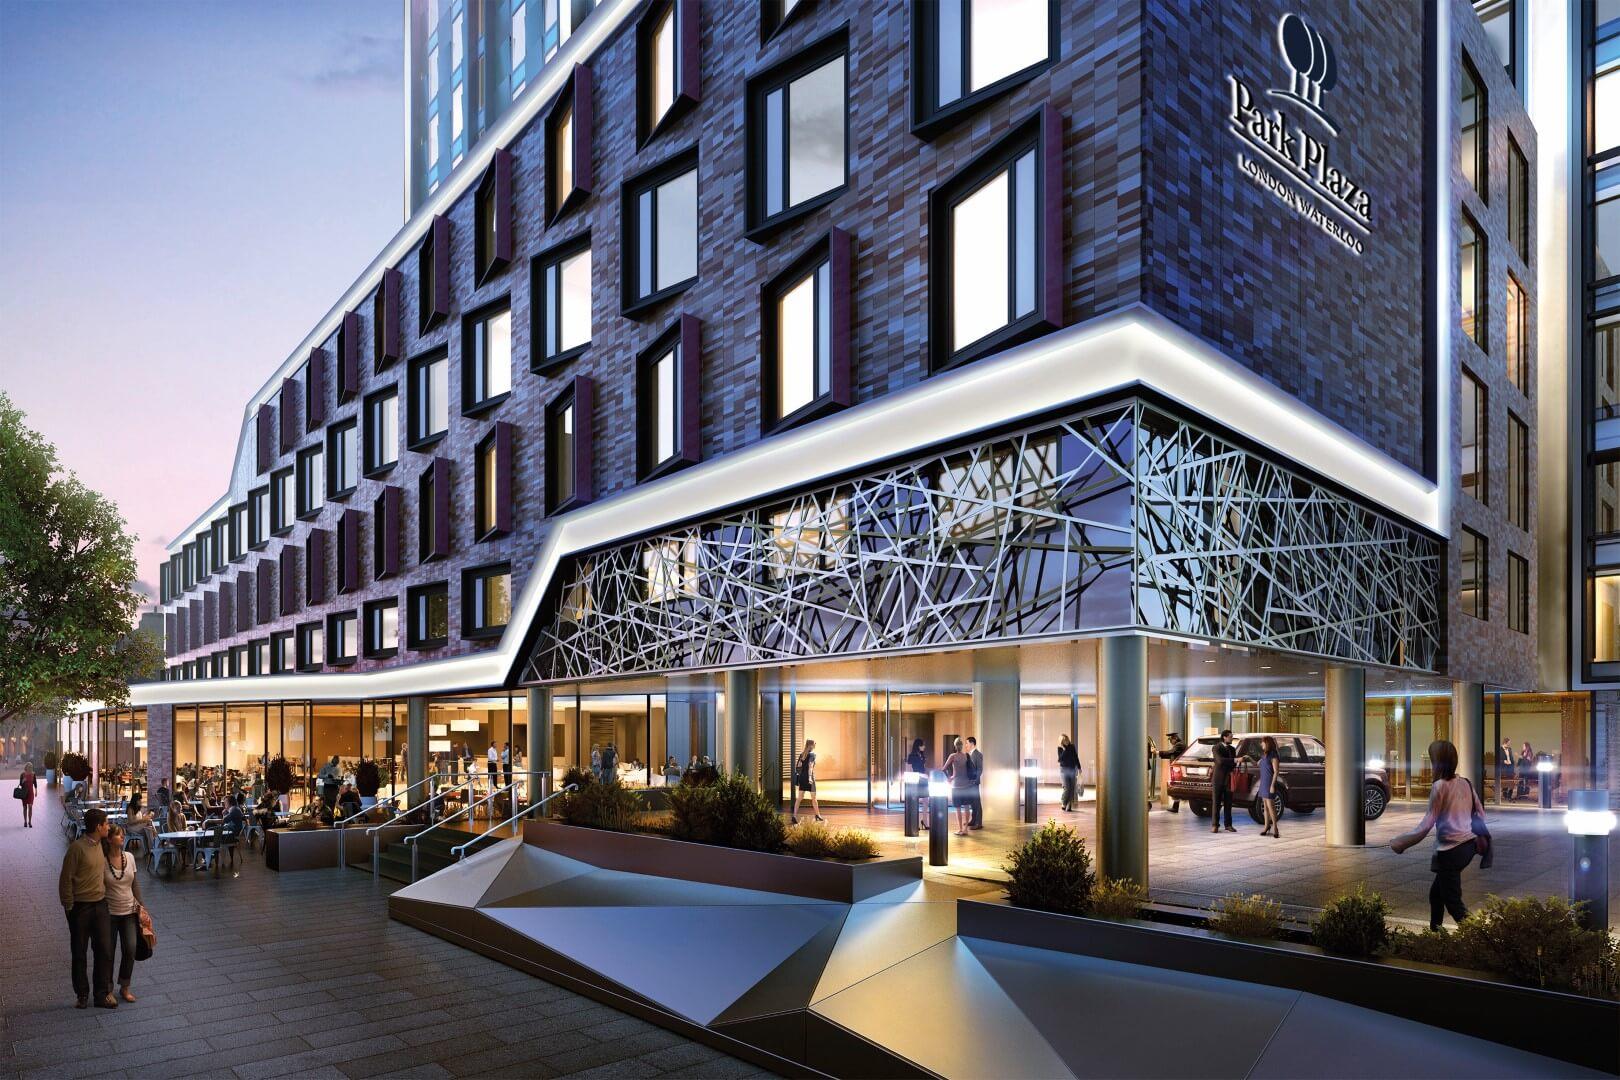 Dining Nightlife South Bank London